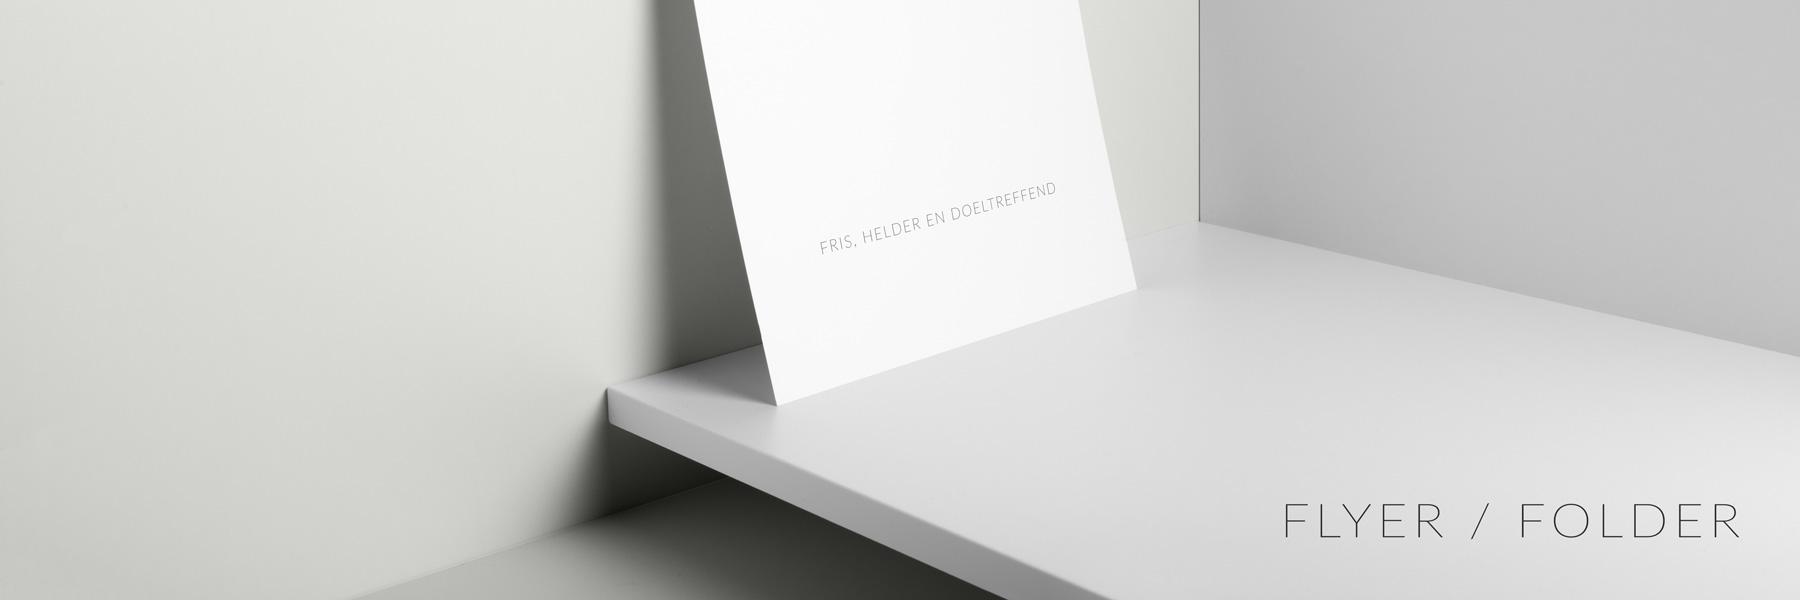 Grafisch zakelijk - design flyer, folder - fris, helder en doeltreffend